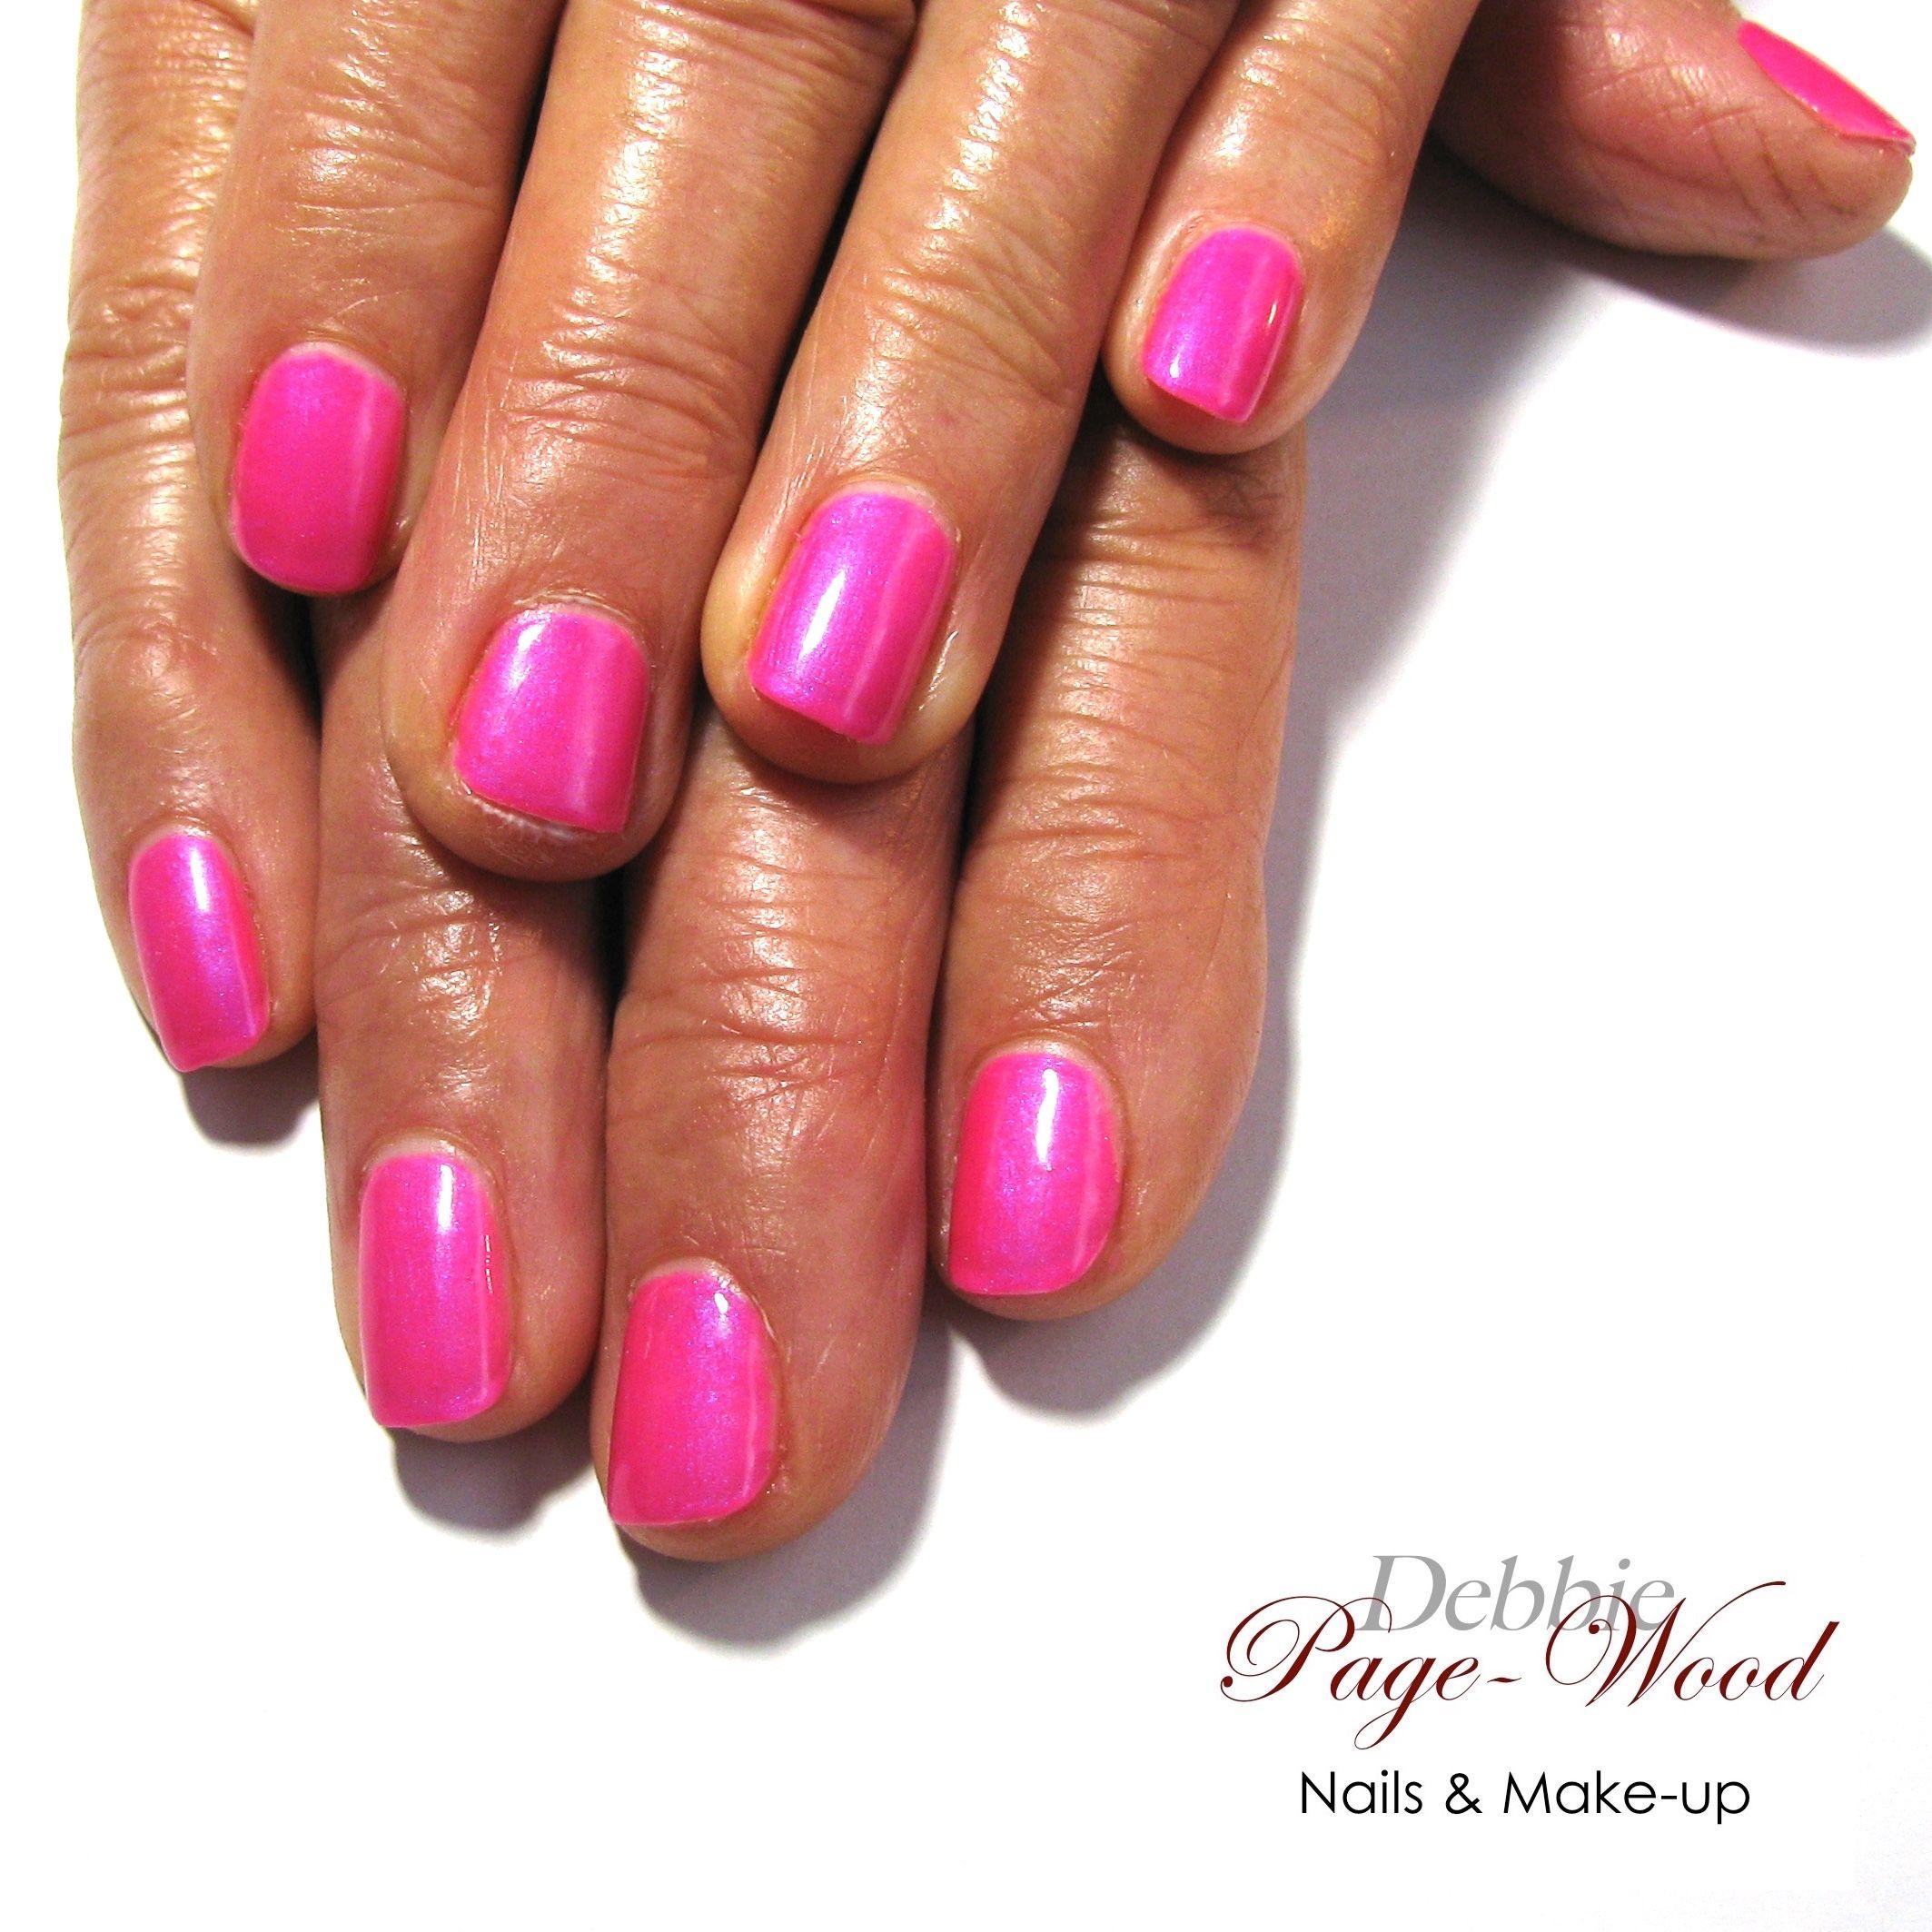 Artistic colour gloss in polka dottie hottie a shimmery